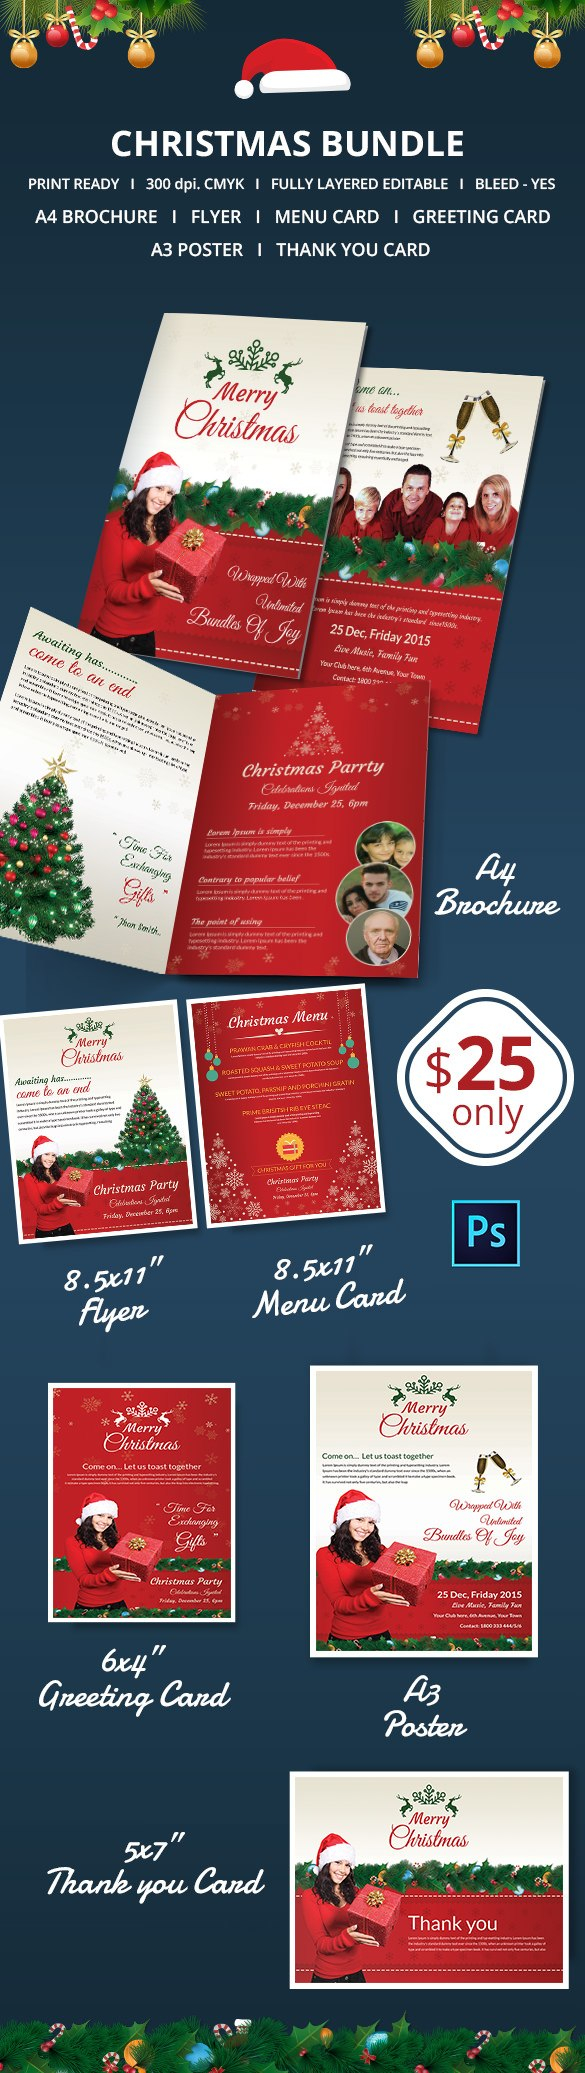 Christmas Brochures Templates  Psd Word Publisher Apple Pertaining To Christmas Brochure Templates Free